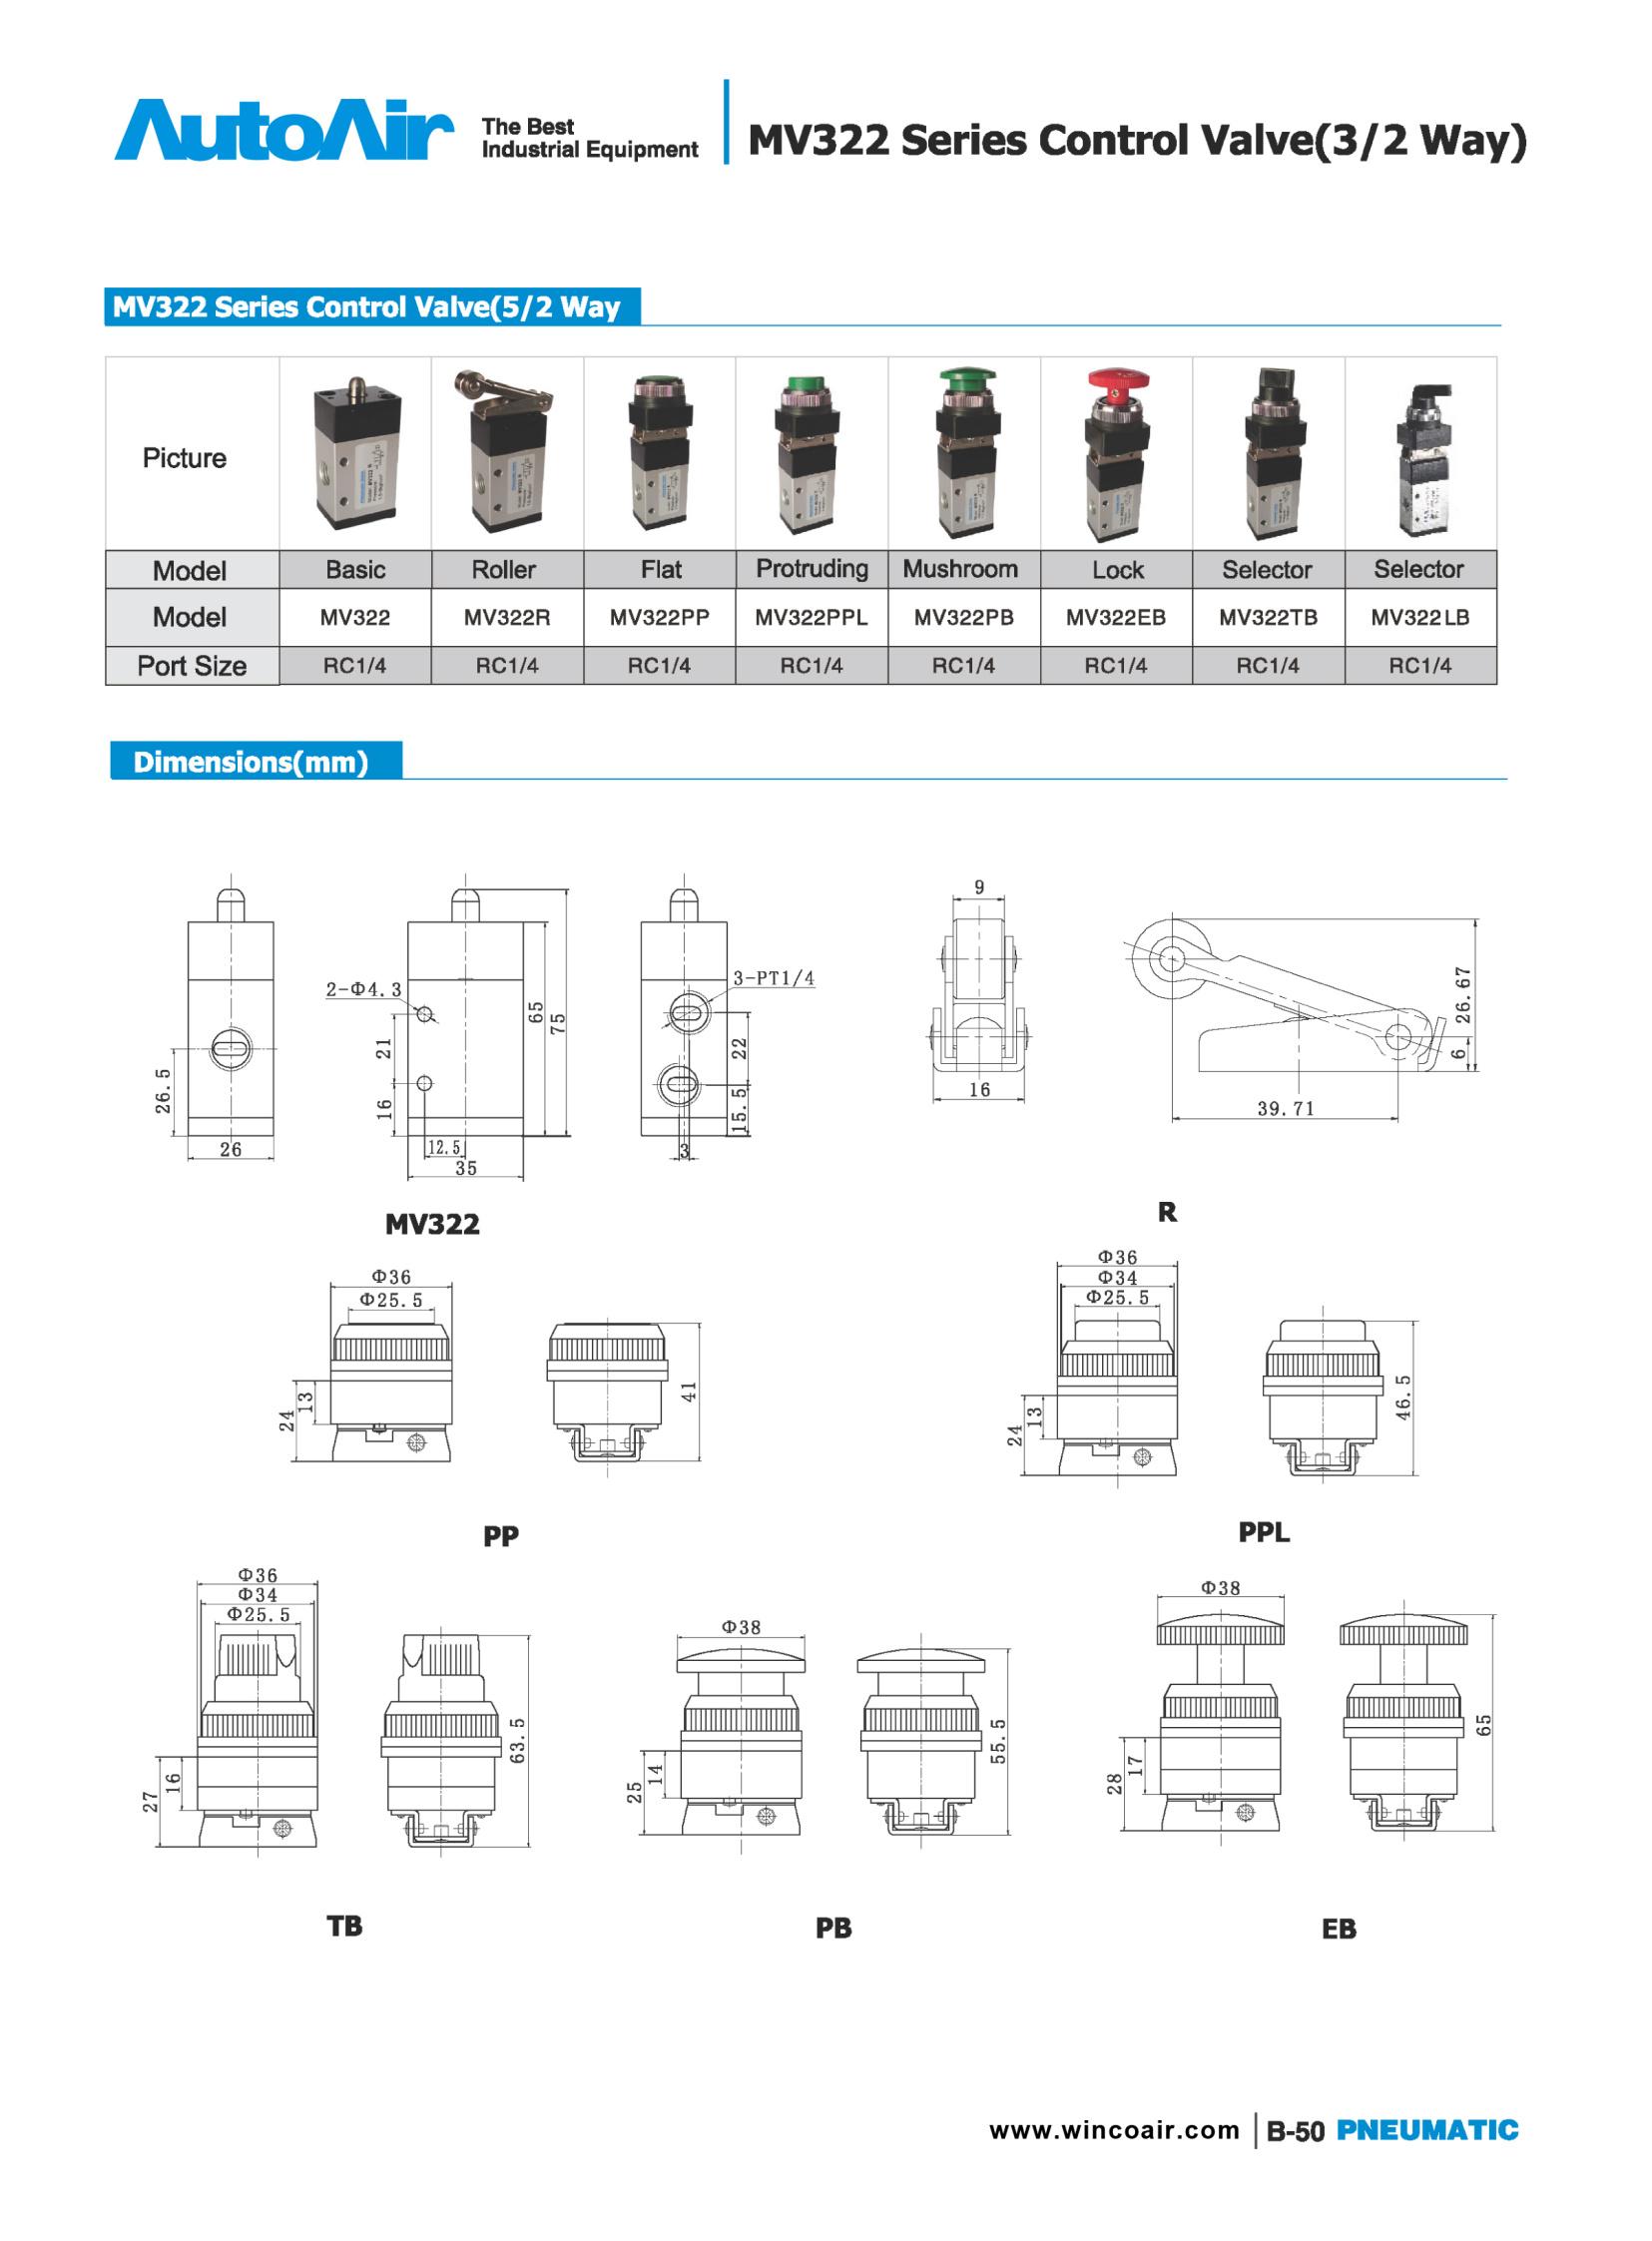 Solenoid valve(50)(1)